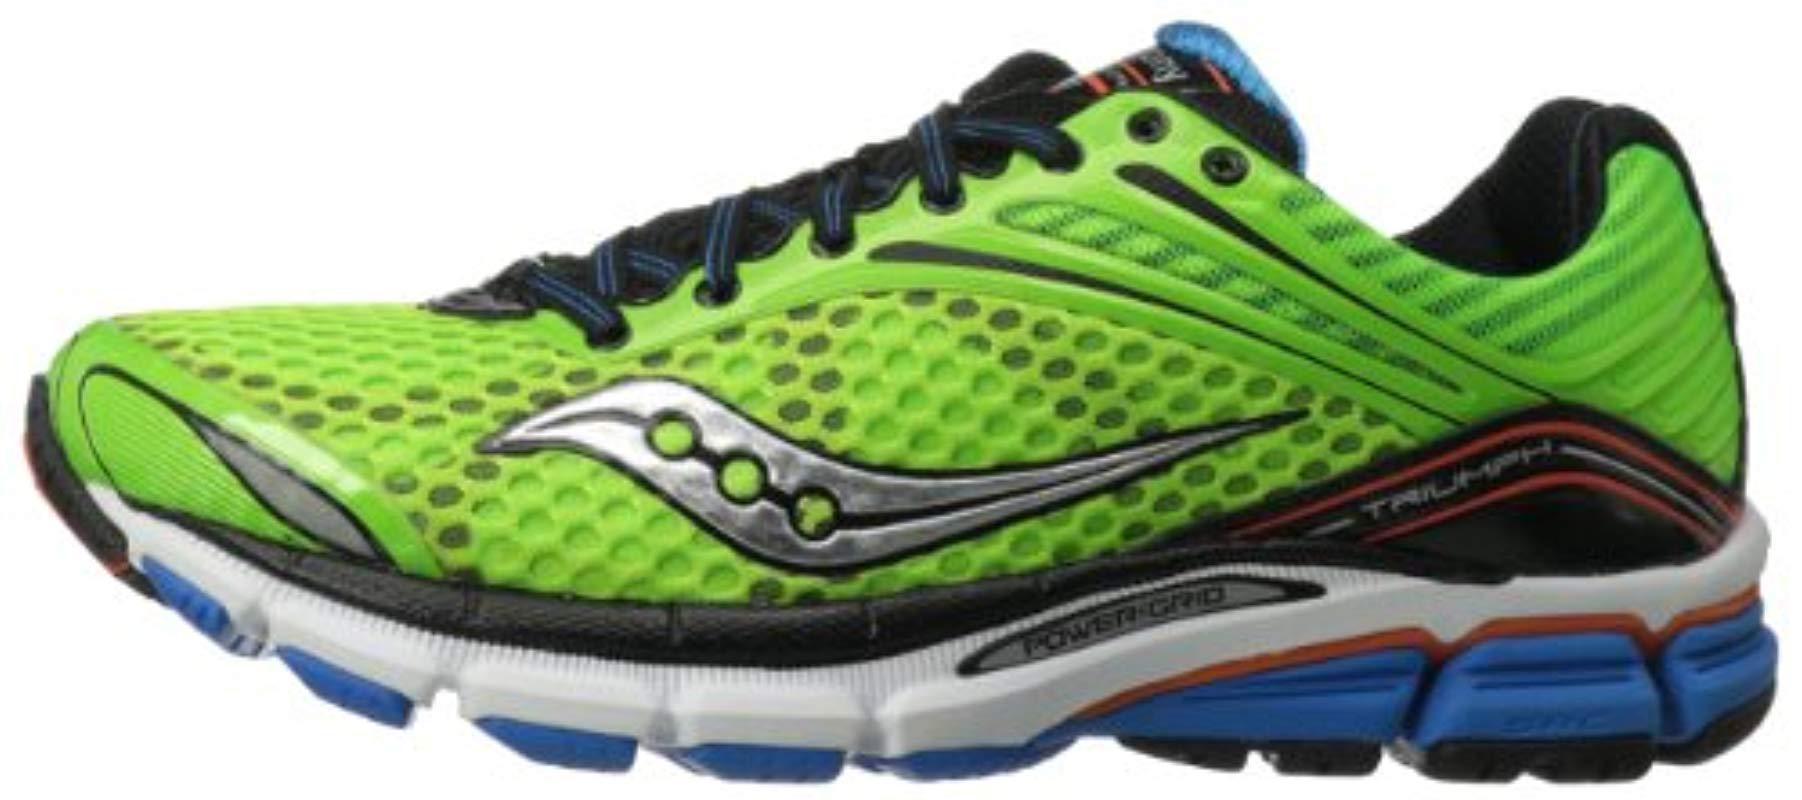 Saucony Triumph 11 Running Shoe in